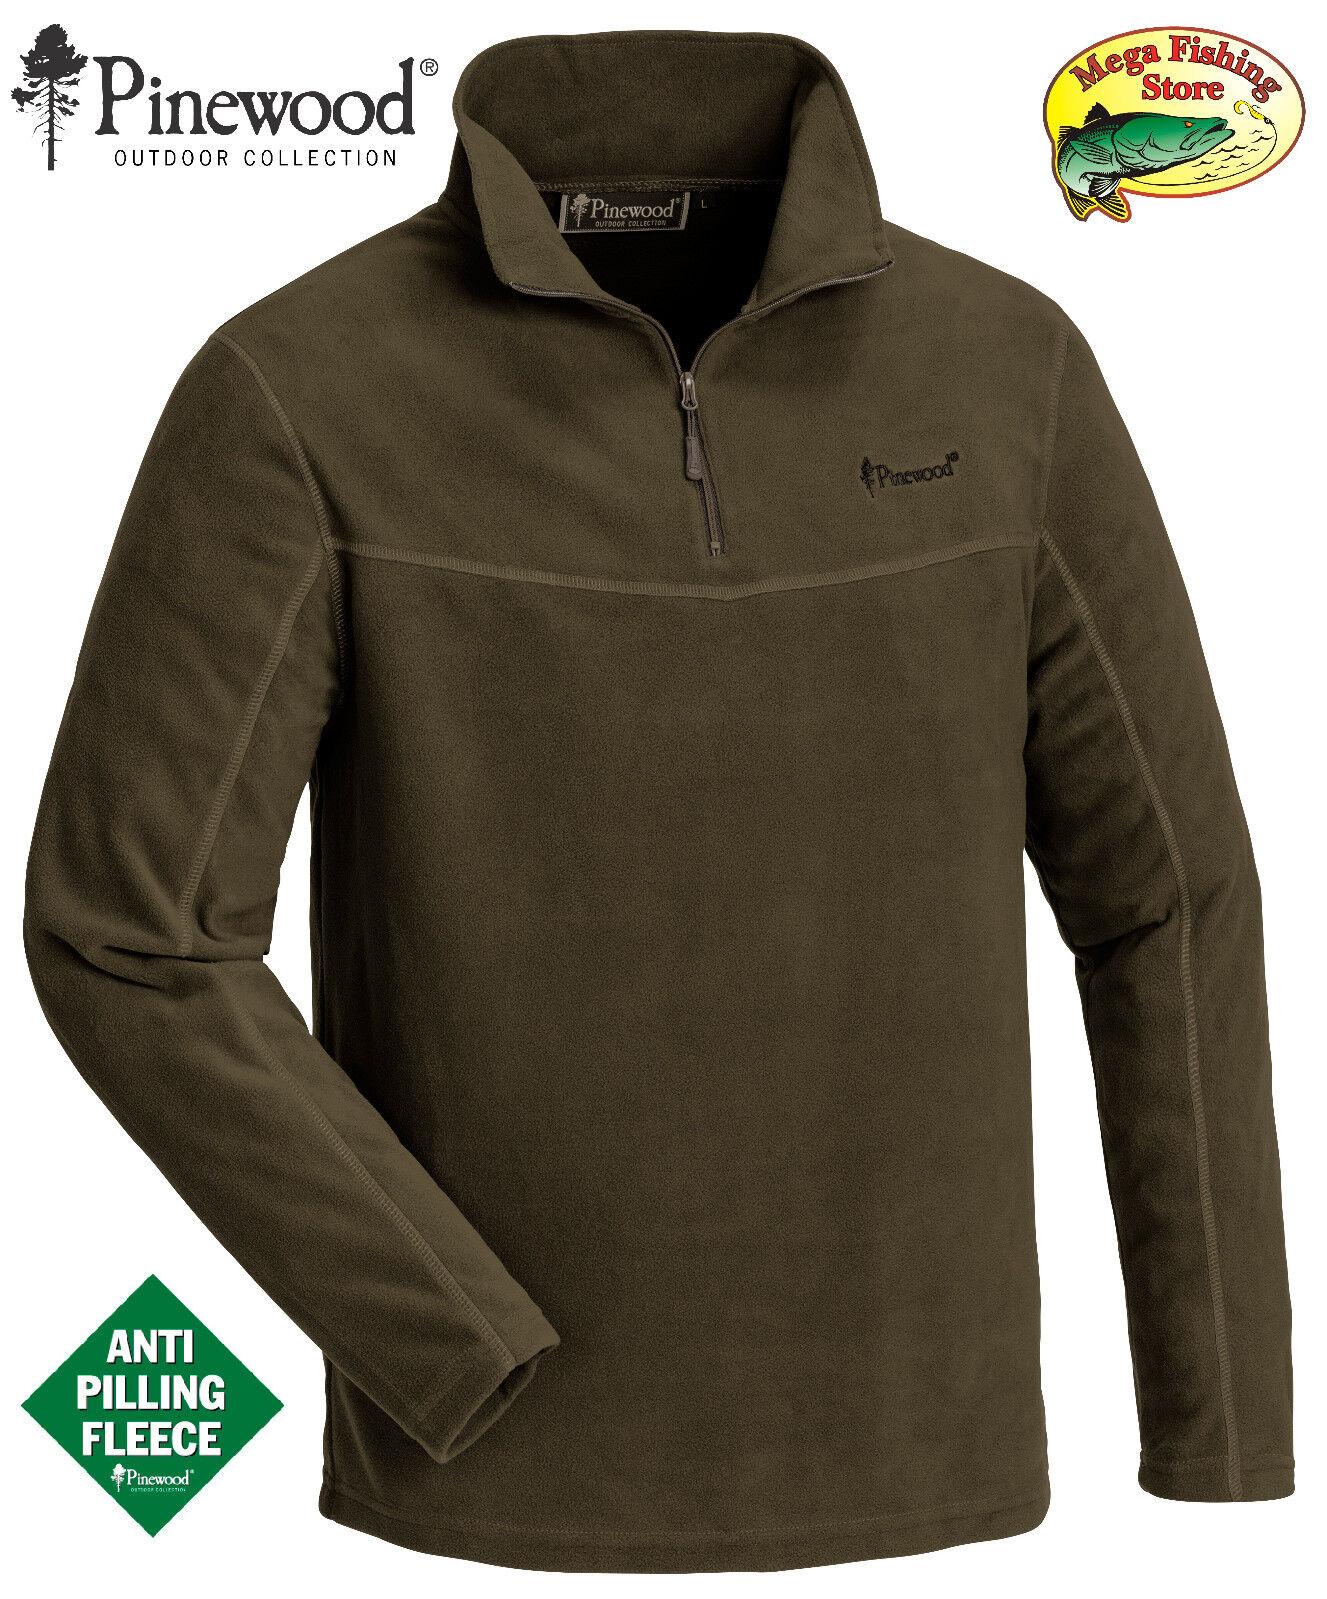 Pinewood 5069 Tiveden Fleece Pullover Jacke Outdoor Fleecejacke Freizeit - Grün